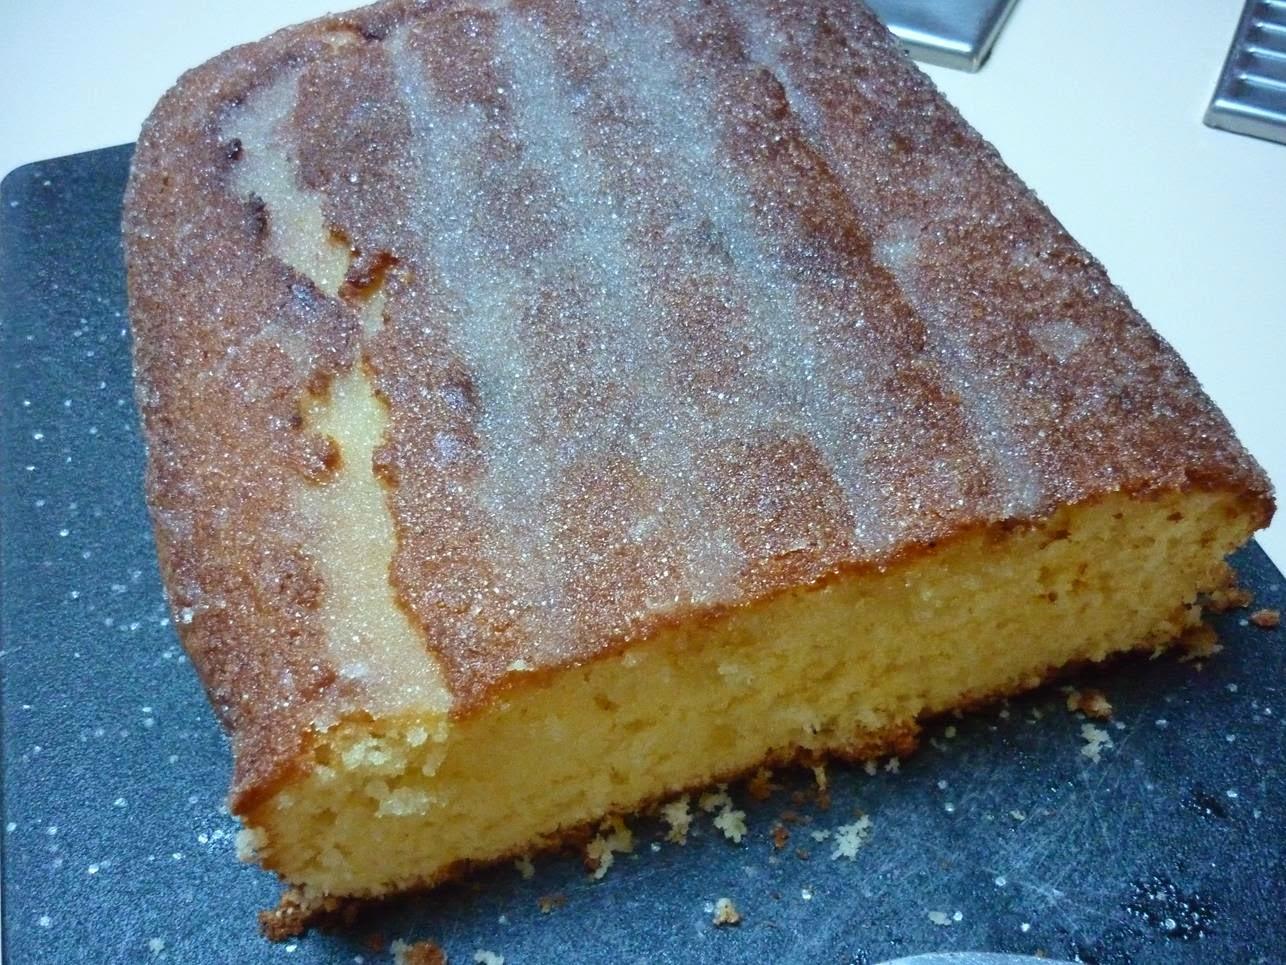 Rachel Bailey Cake Artist : LoveCats DownUnder: Baking Daze